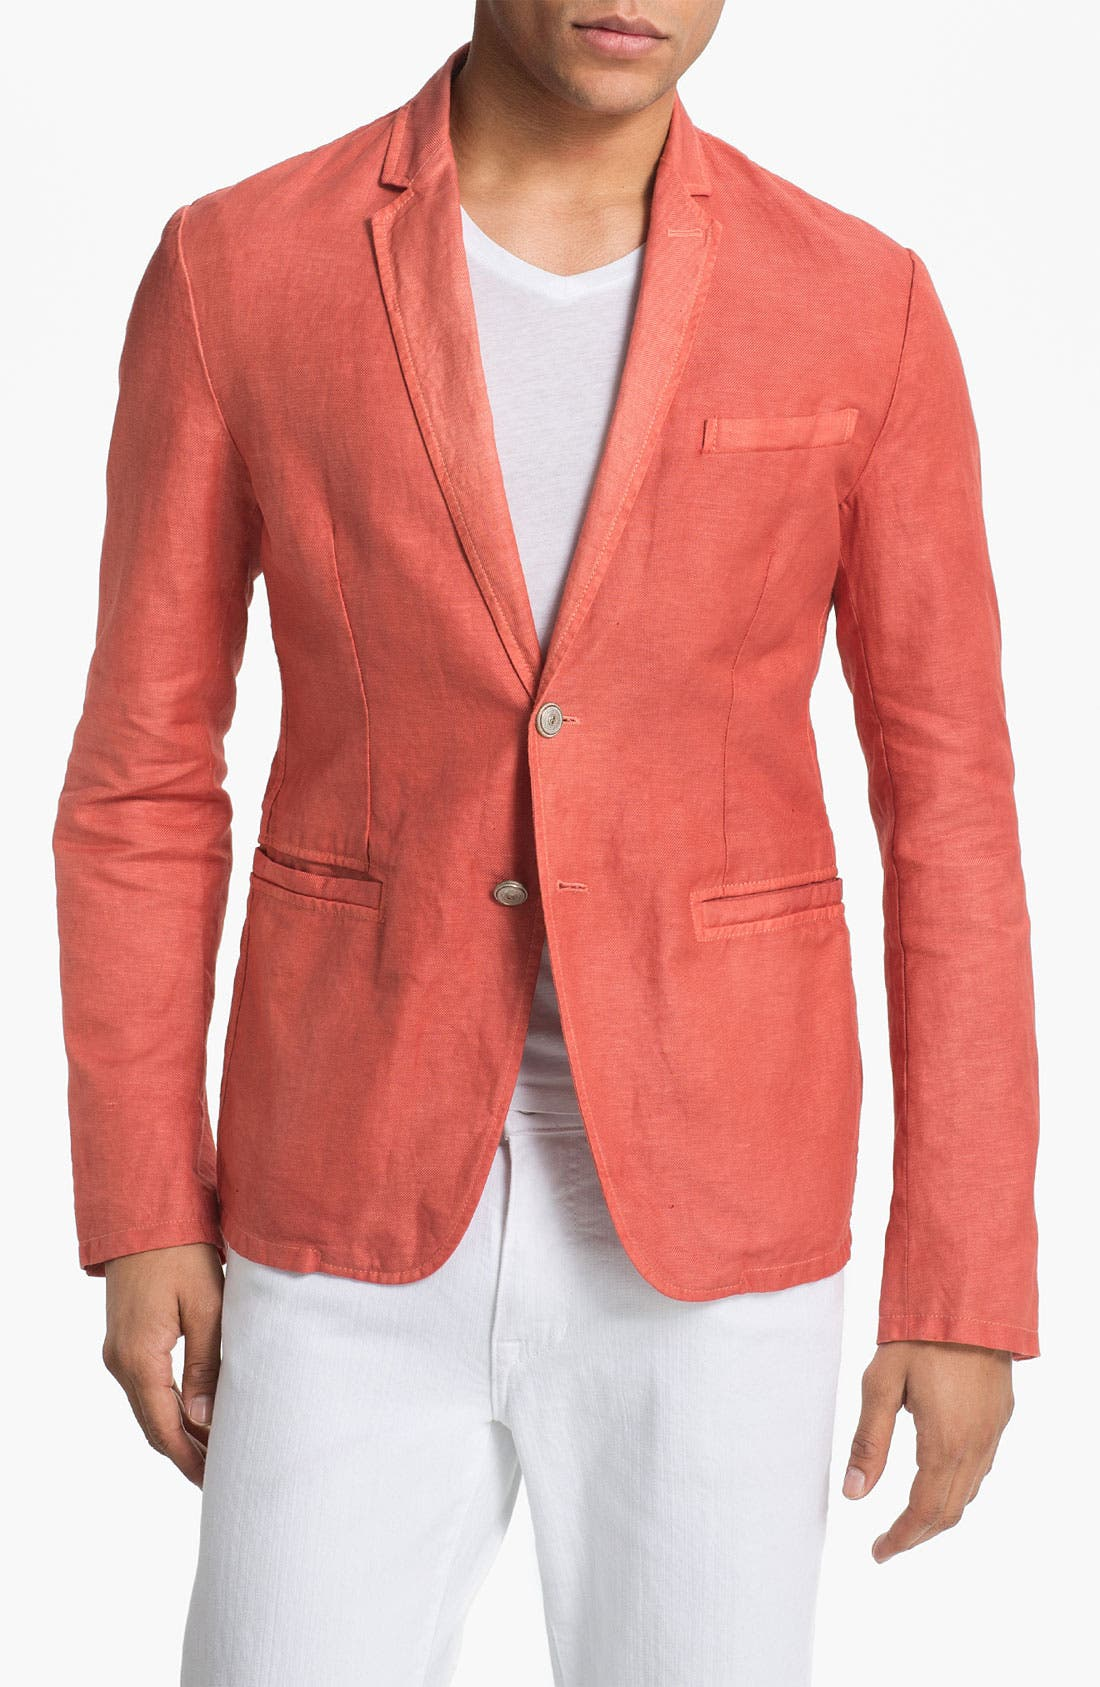 Alternate Image 1 Selected - Just Cavalli Cotton & Linen Blazer